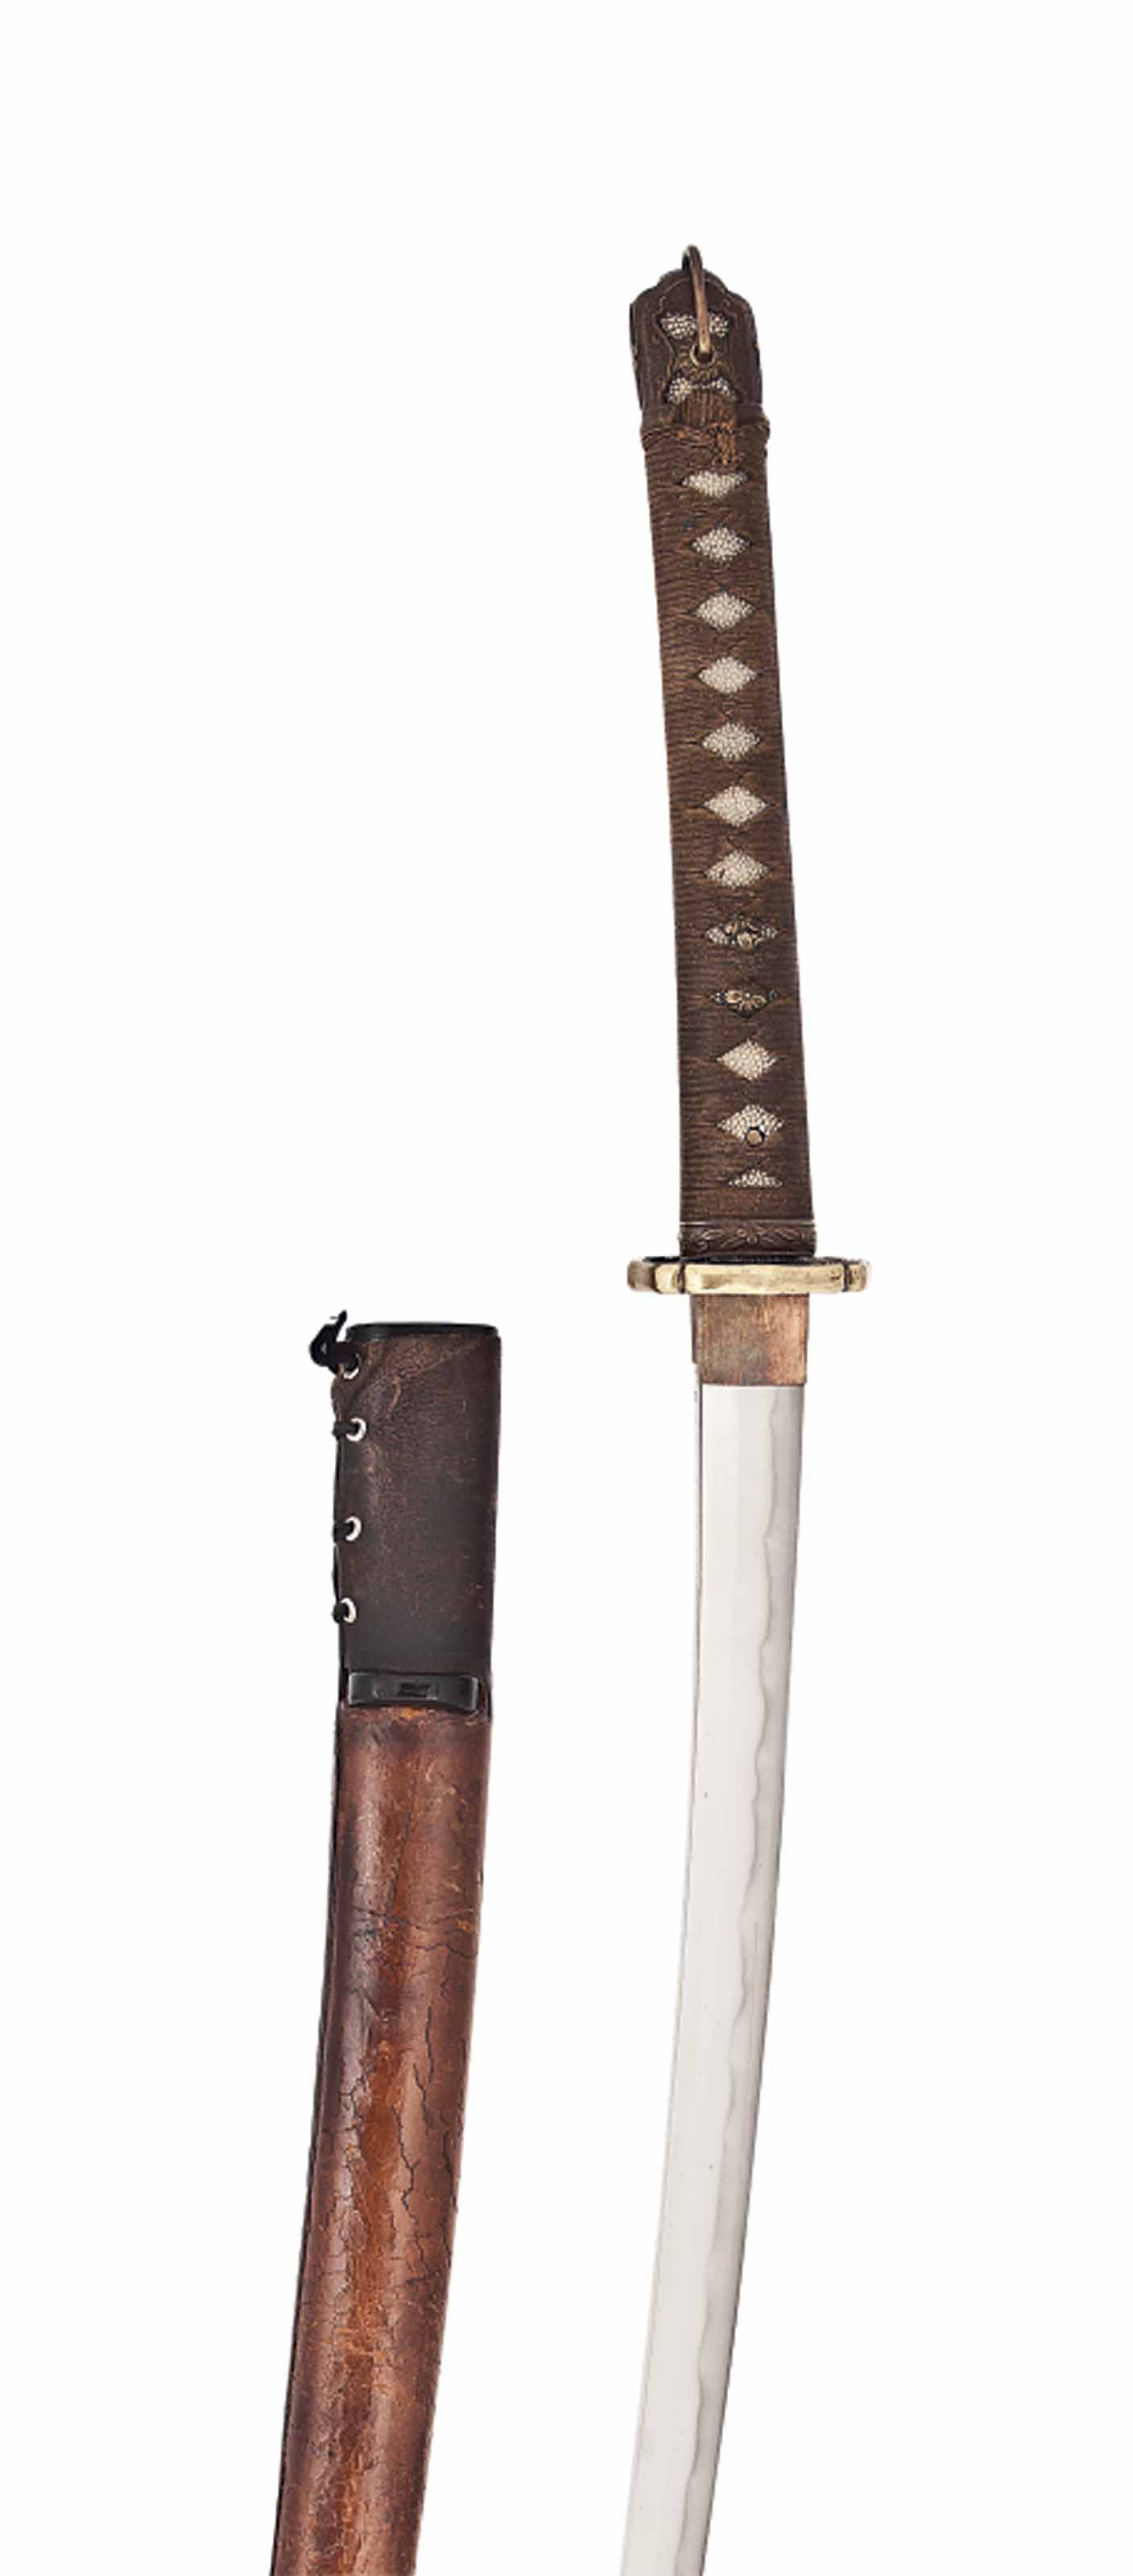 A JAPANESE OFFICER'S SWORD (GUNTO)